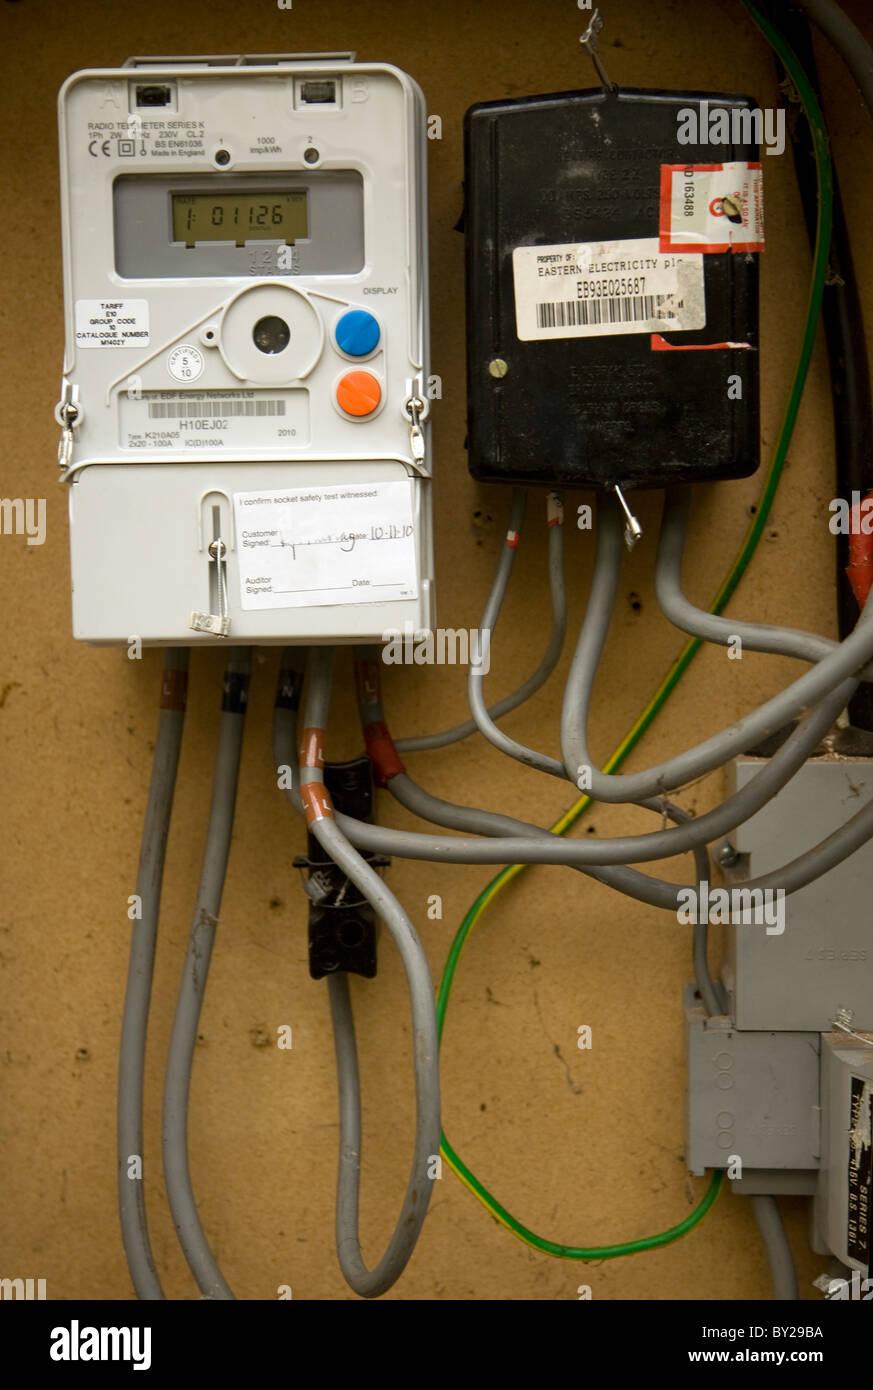 Electric Energy Meter Uk Stock Photos Amp Electric Energy